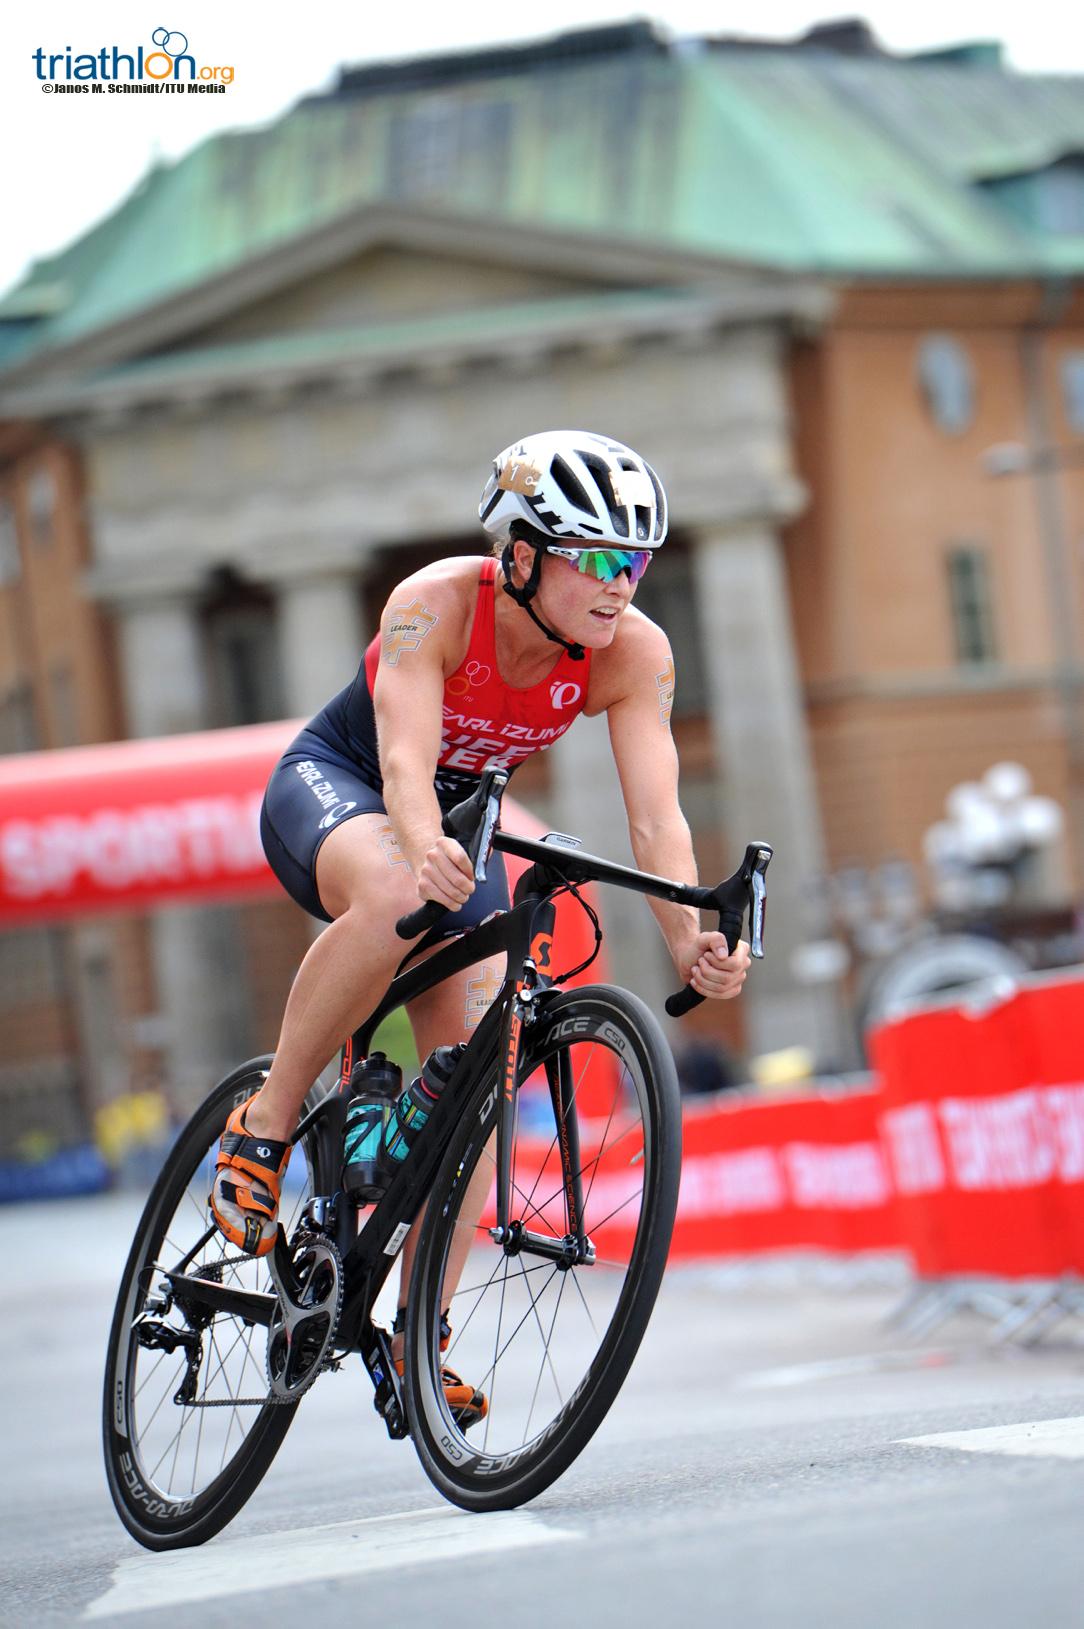 Flora Duffy biking in stockholm